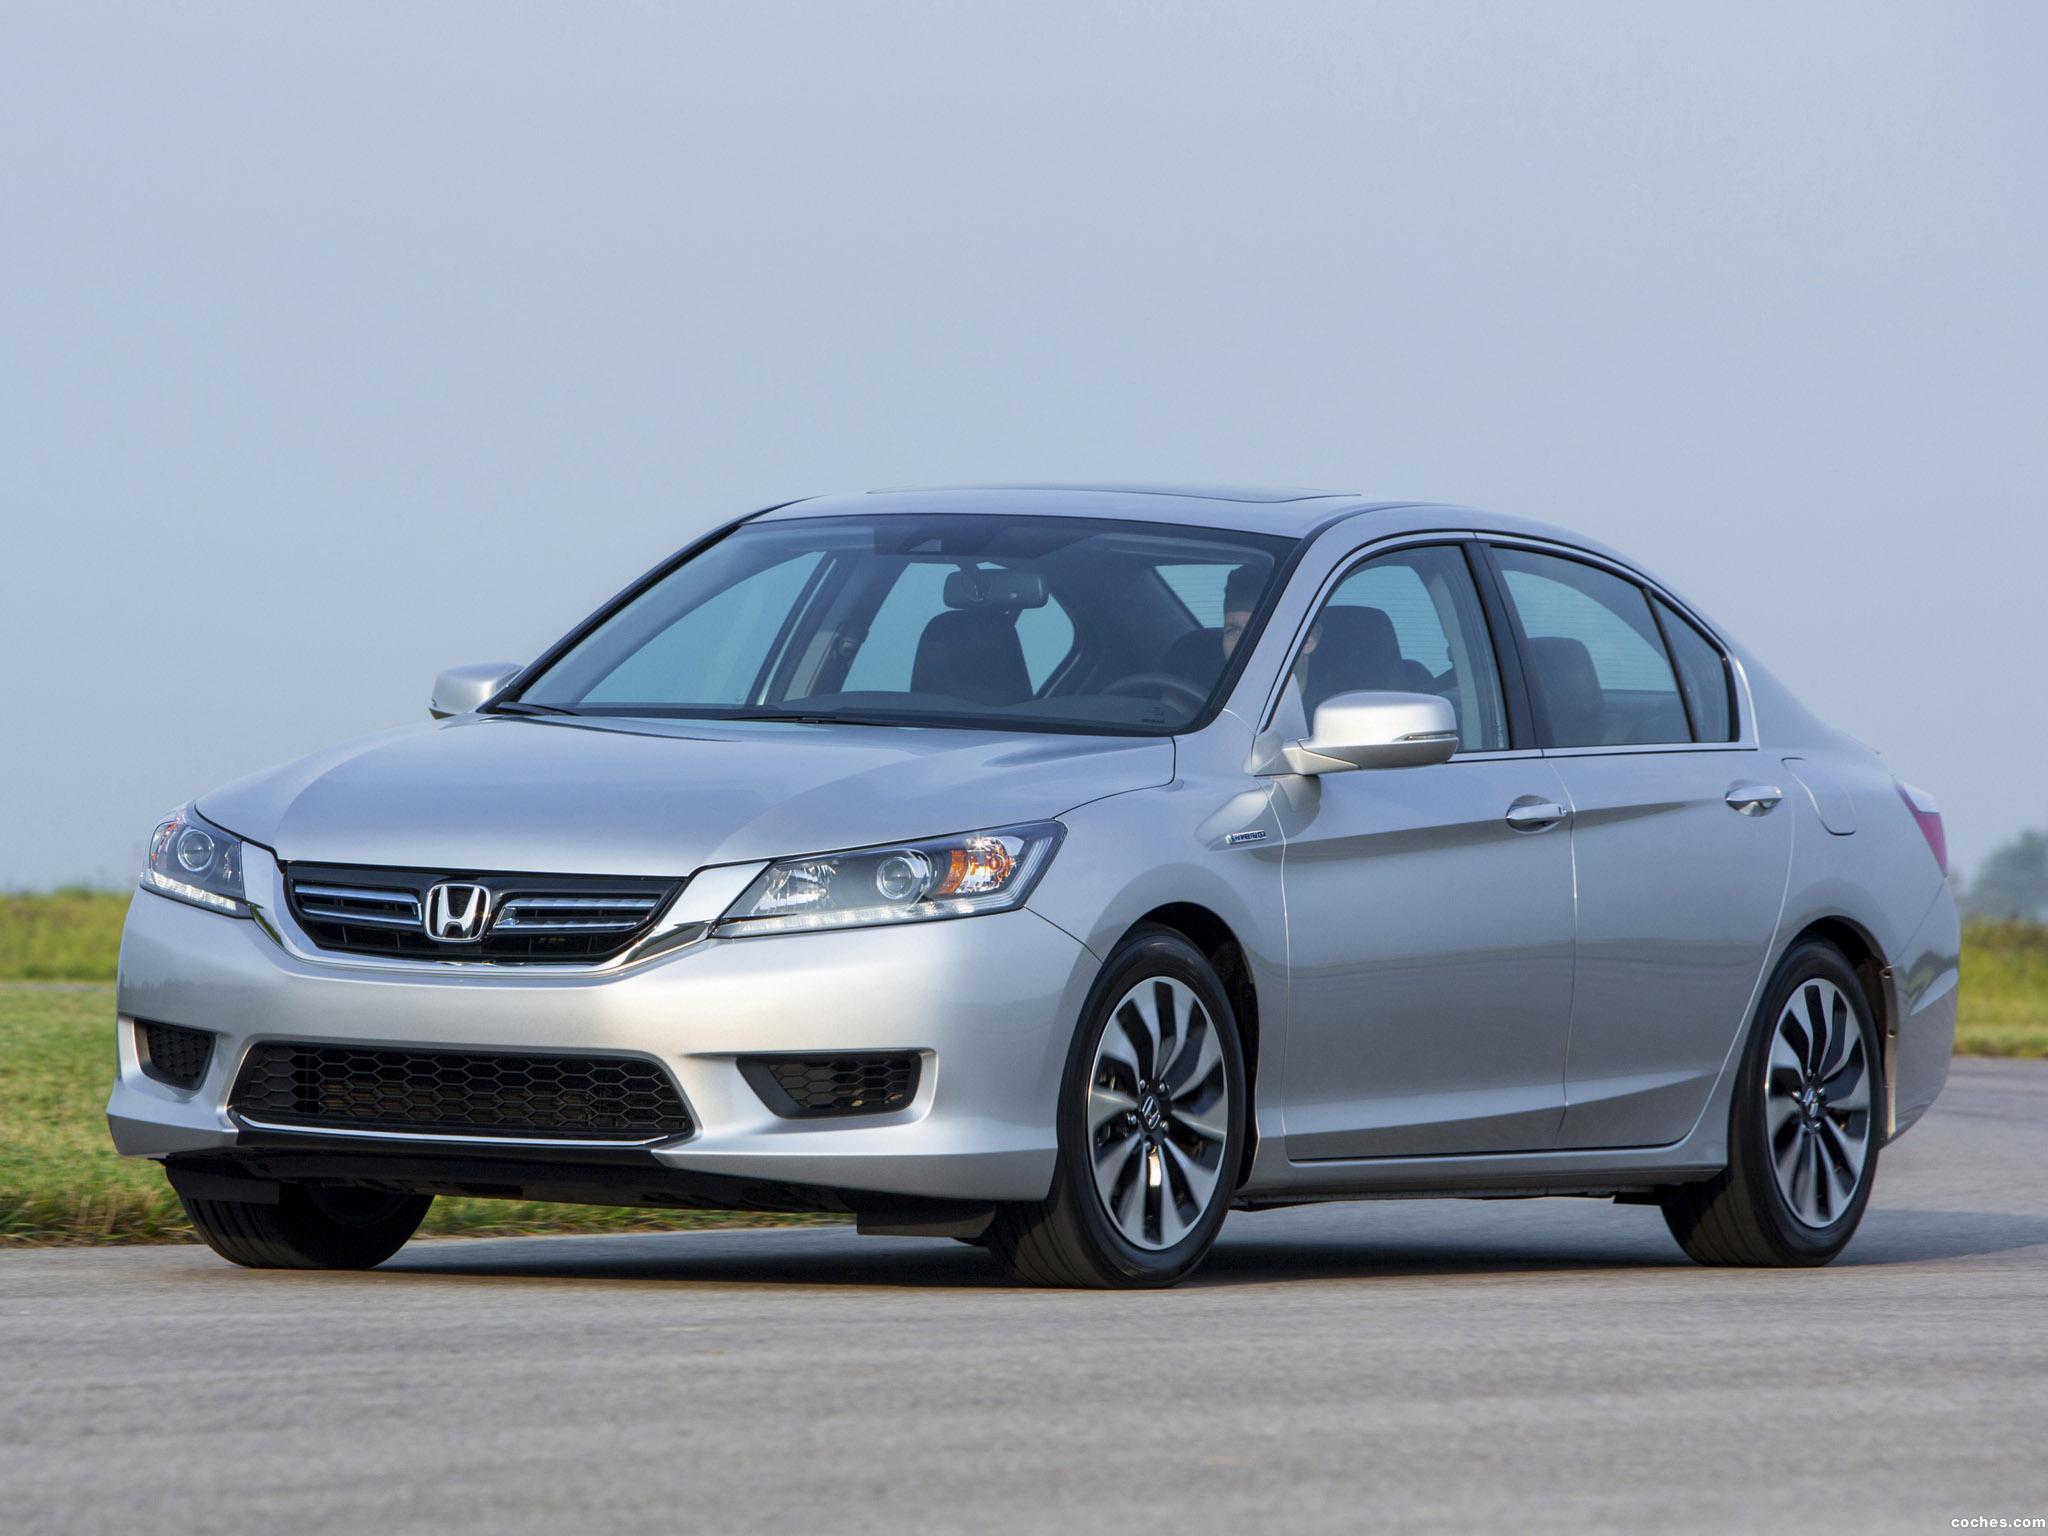 Foto 0 de Honda Accord Hybrid EX-L USA 2013